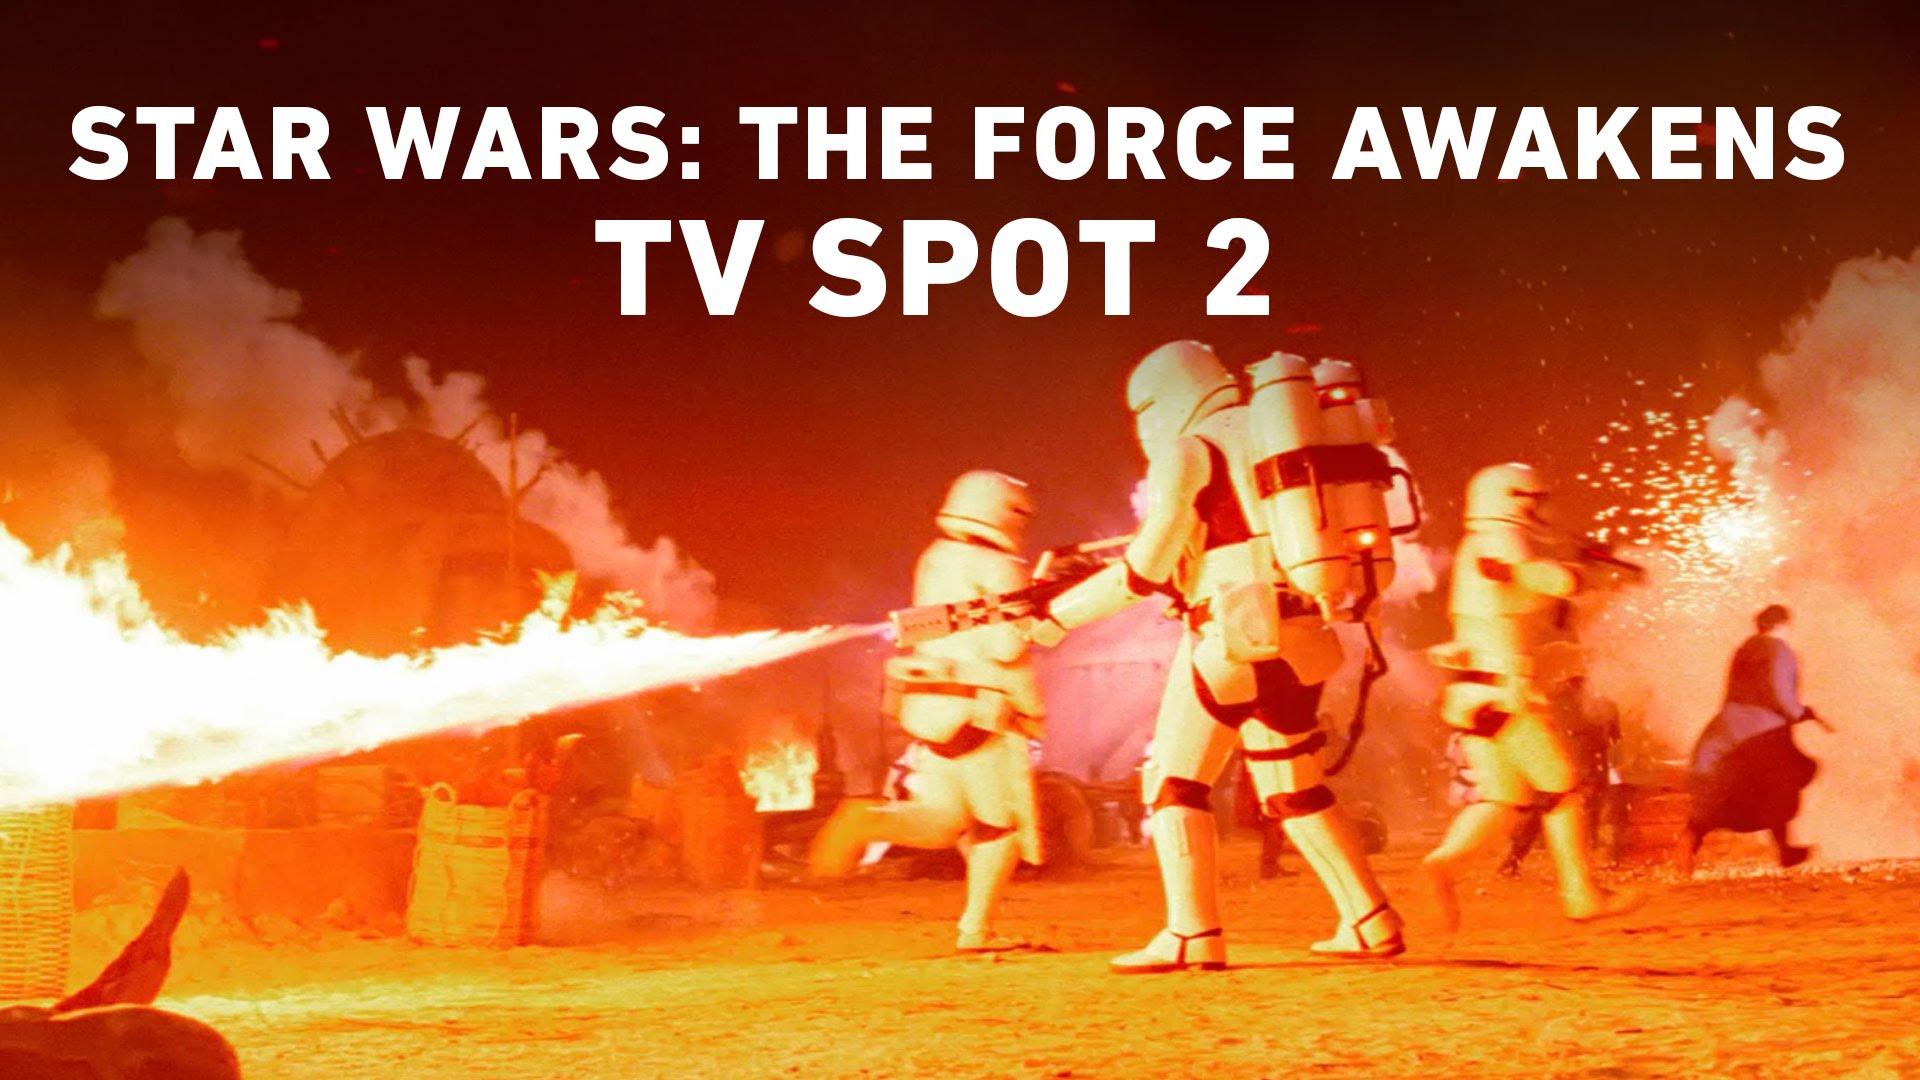 Star Wars: The Force Awakens TV Spot 2 (Official)